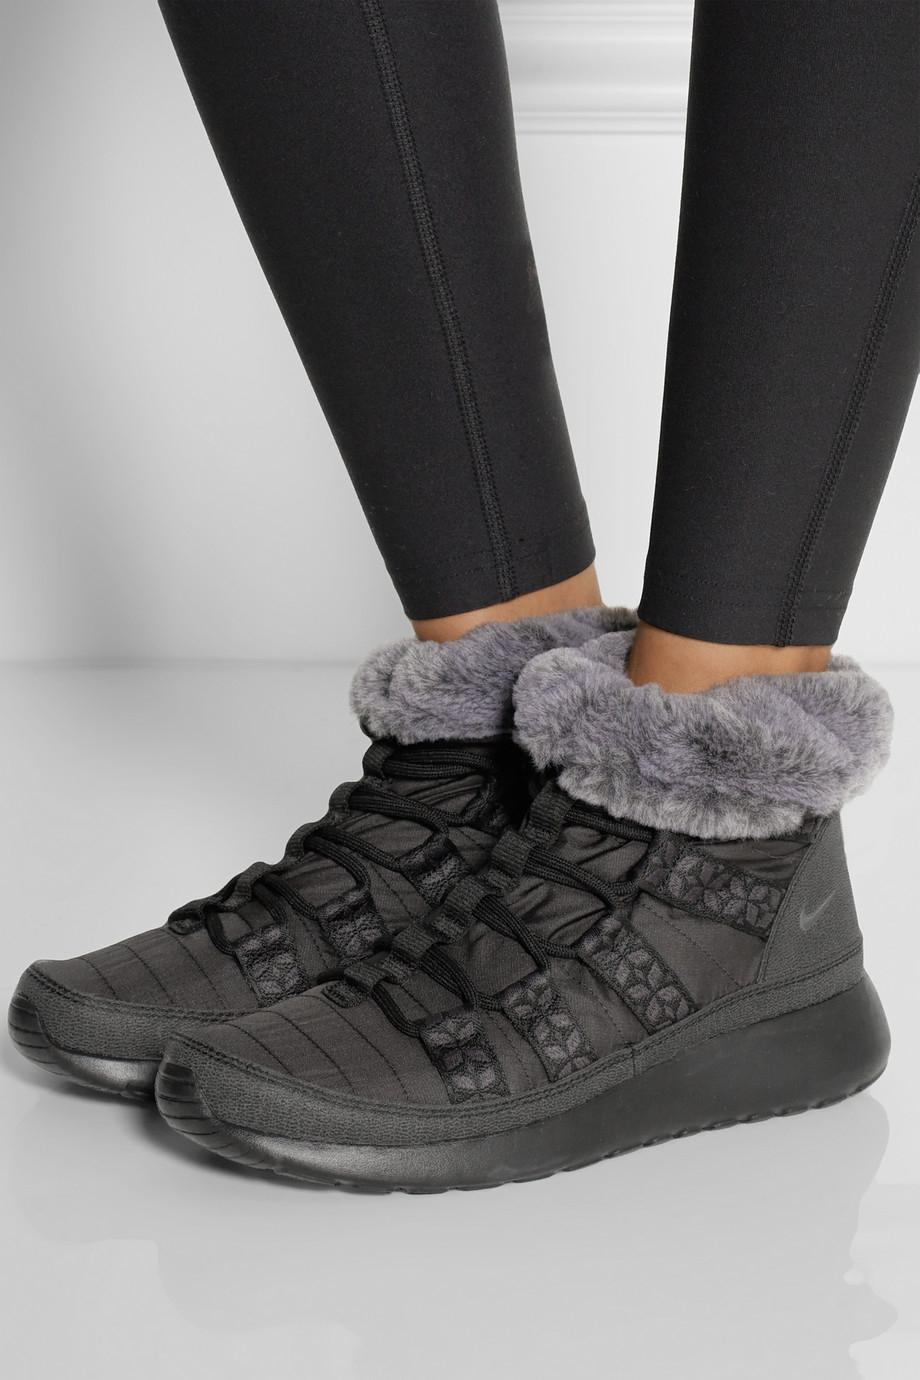 Lyst Nike Roshe Run Hi Shell Sneaker Style Boots In Black